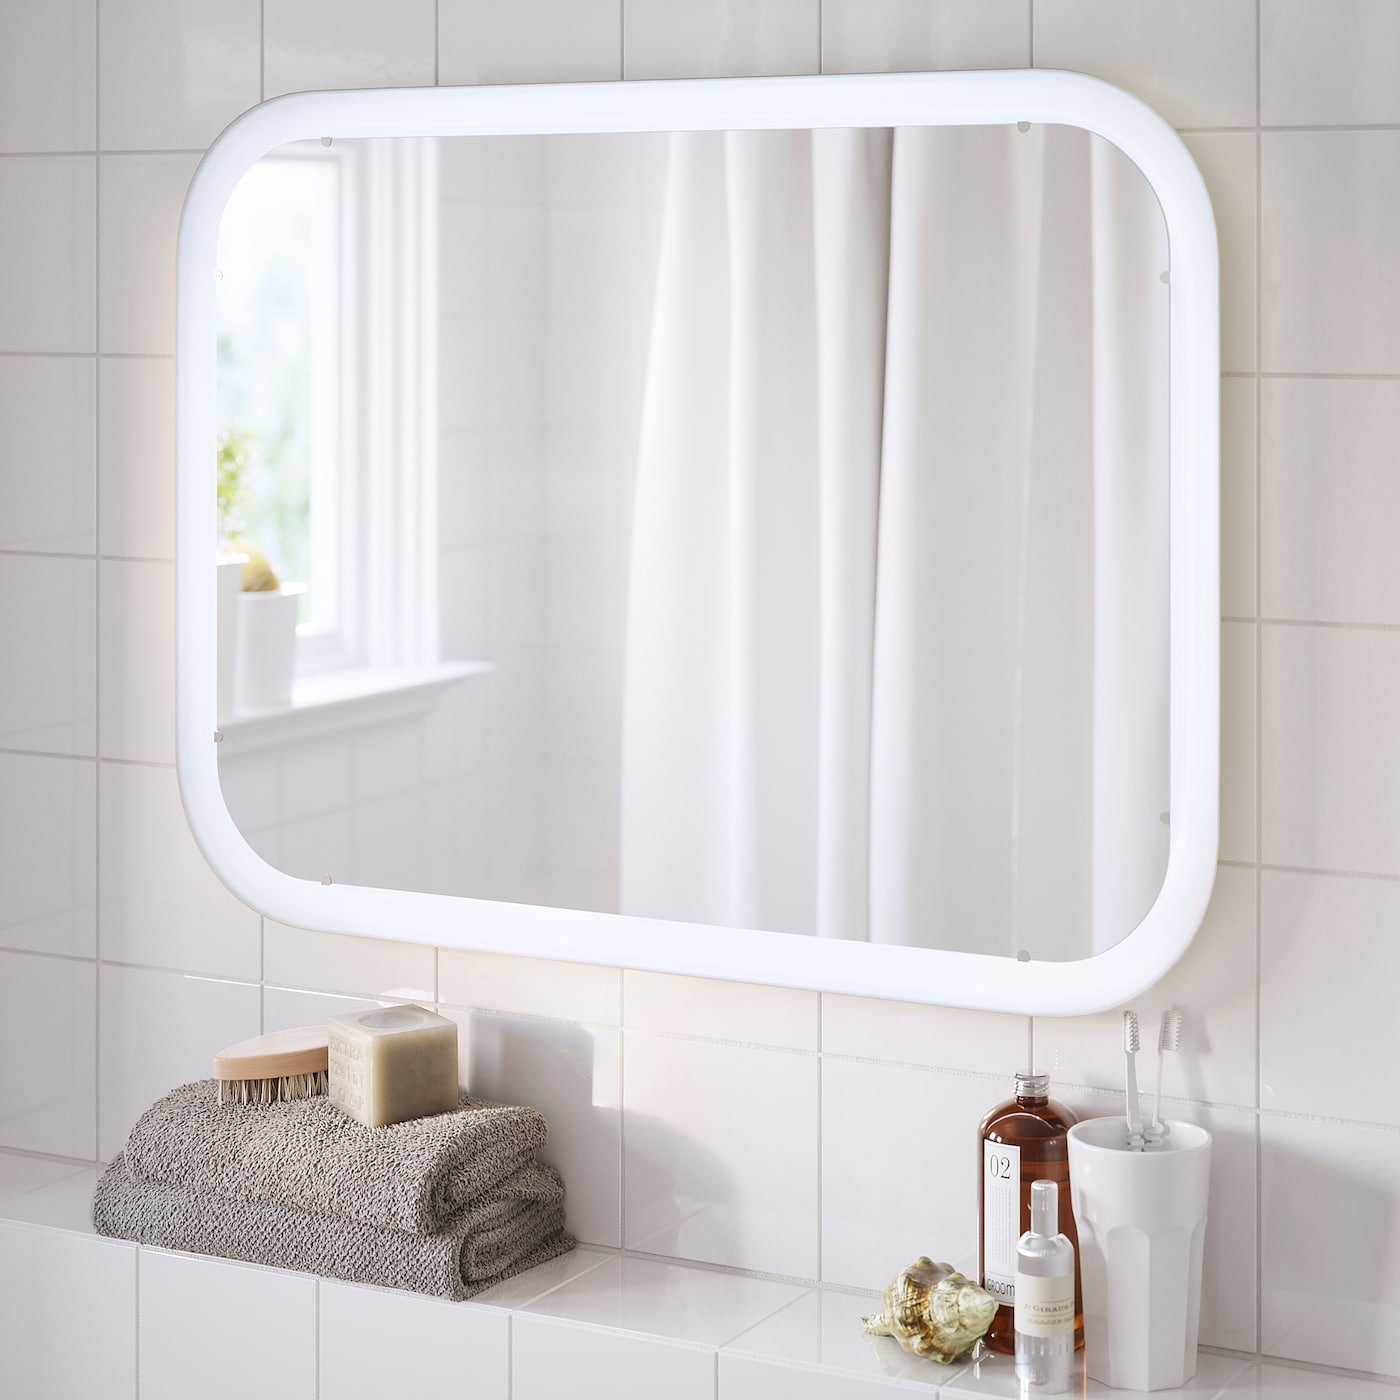 Storjorm Spejl Med Integreret Belysning Hvid 80x60 Cm Ikea